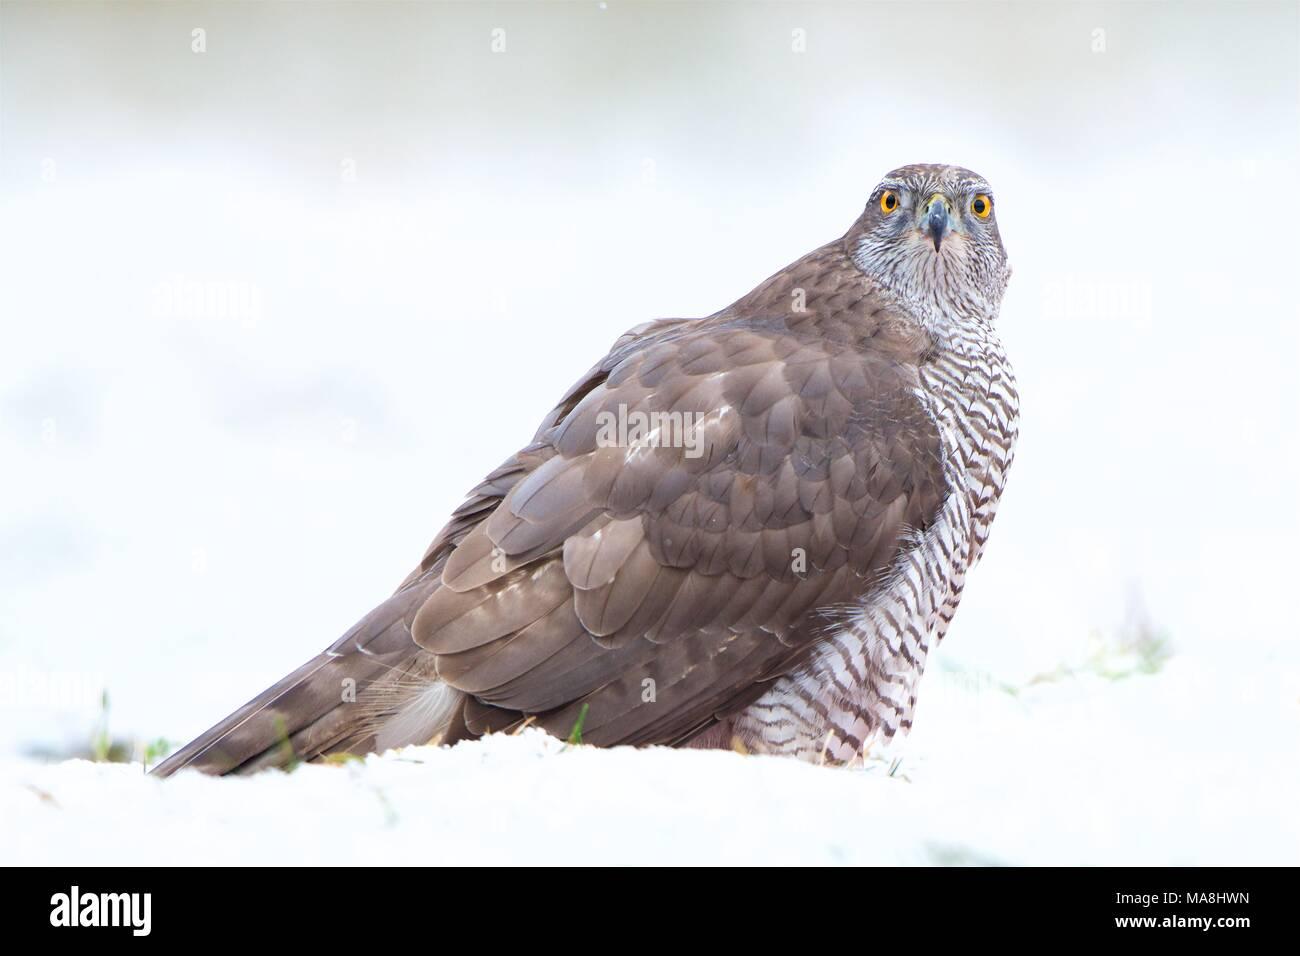 Goshawk (Accipiter gentilis) closeup in snowfall backdrop.  Primer plano de Azor (Accipiter gentilis) con fondo nevado. Stock Photo